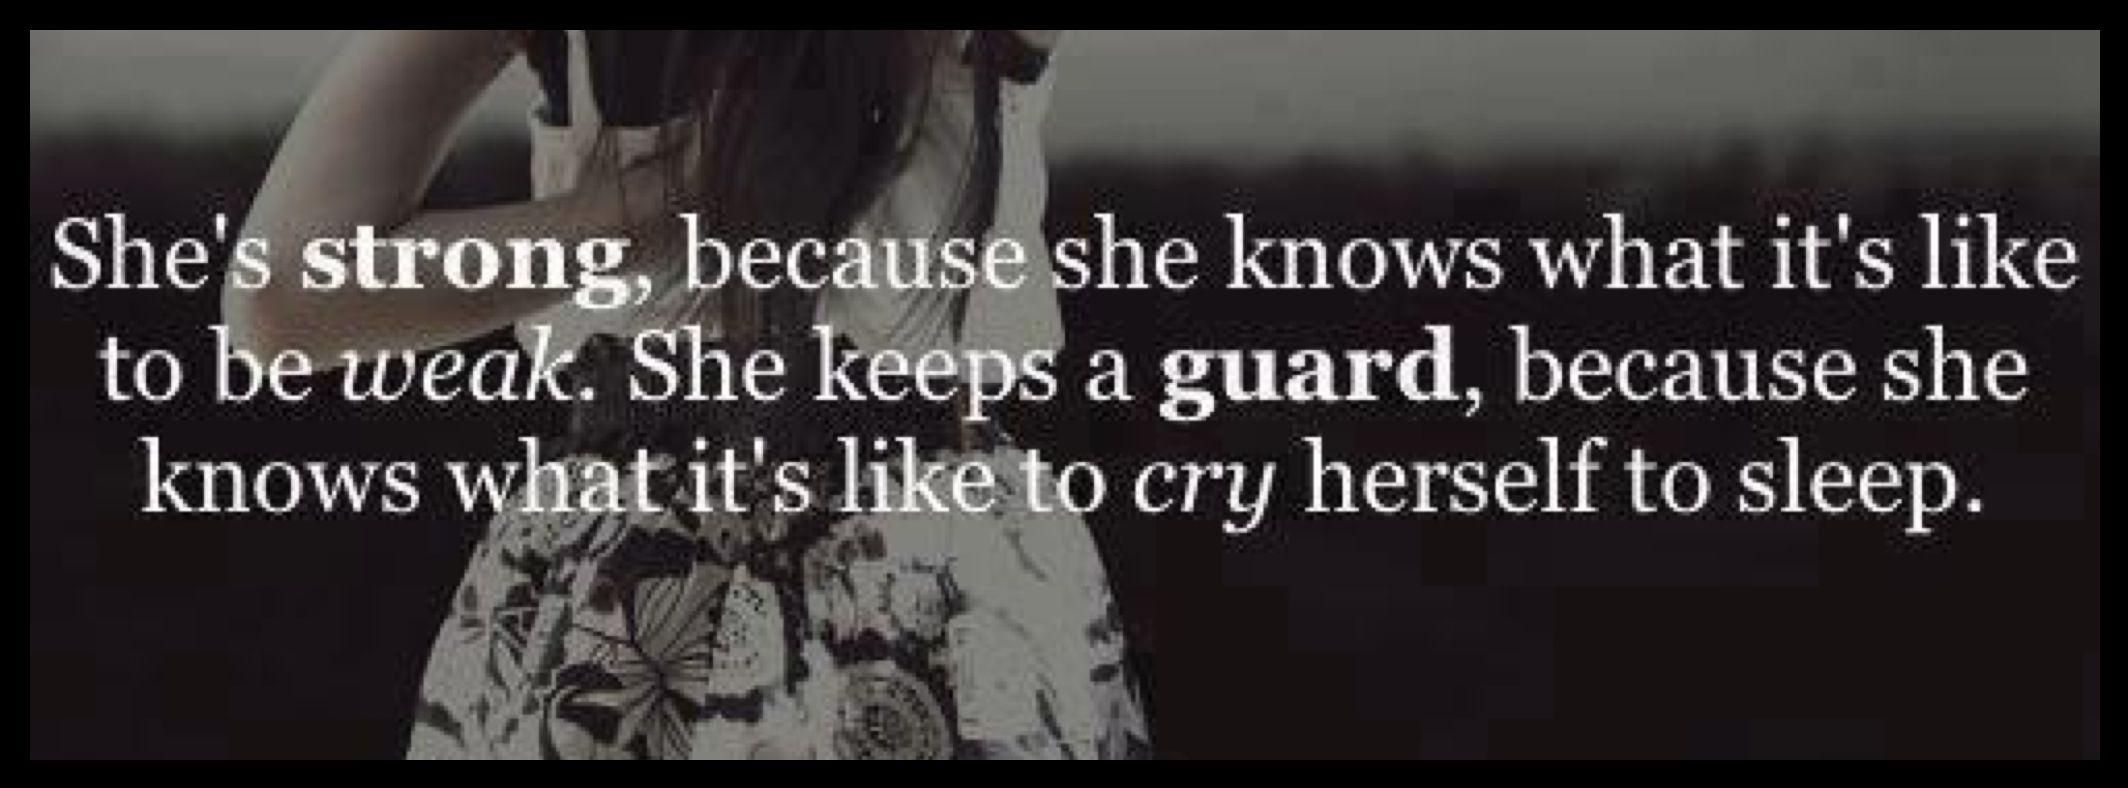 Guarded Quotes. QuotesGram